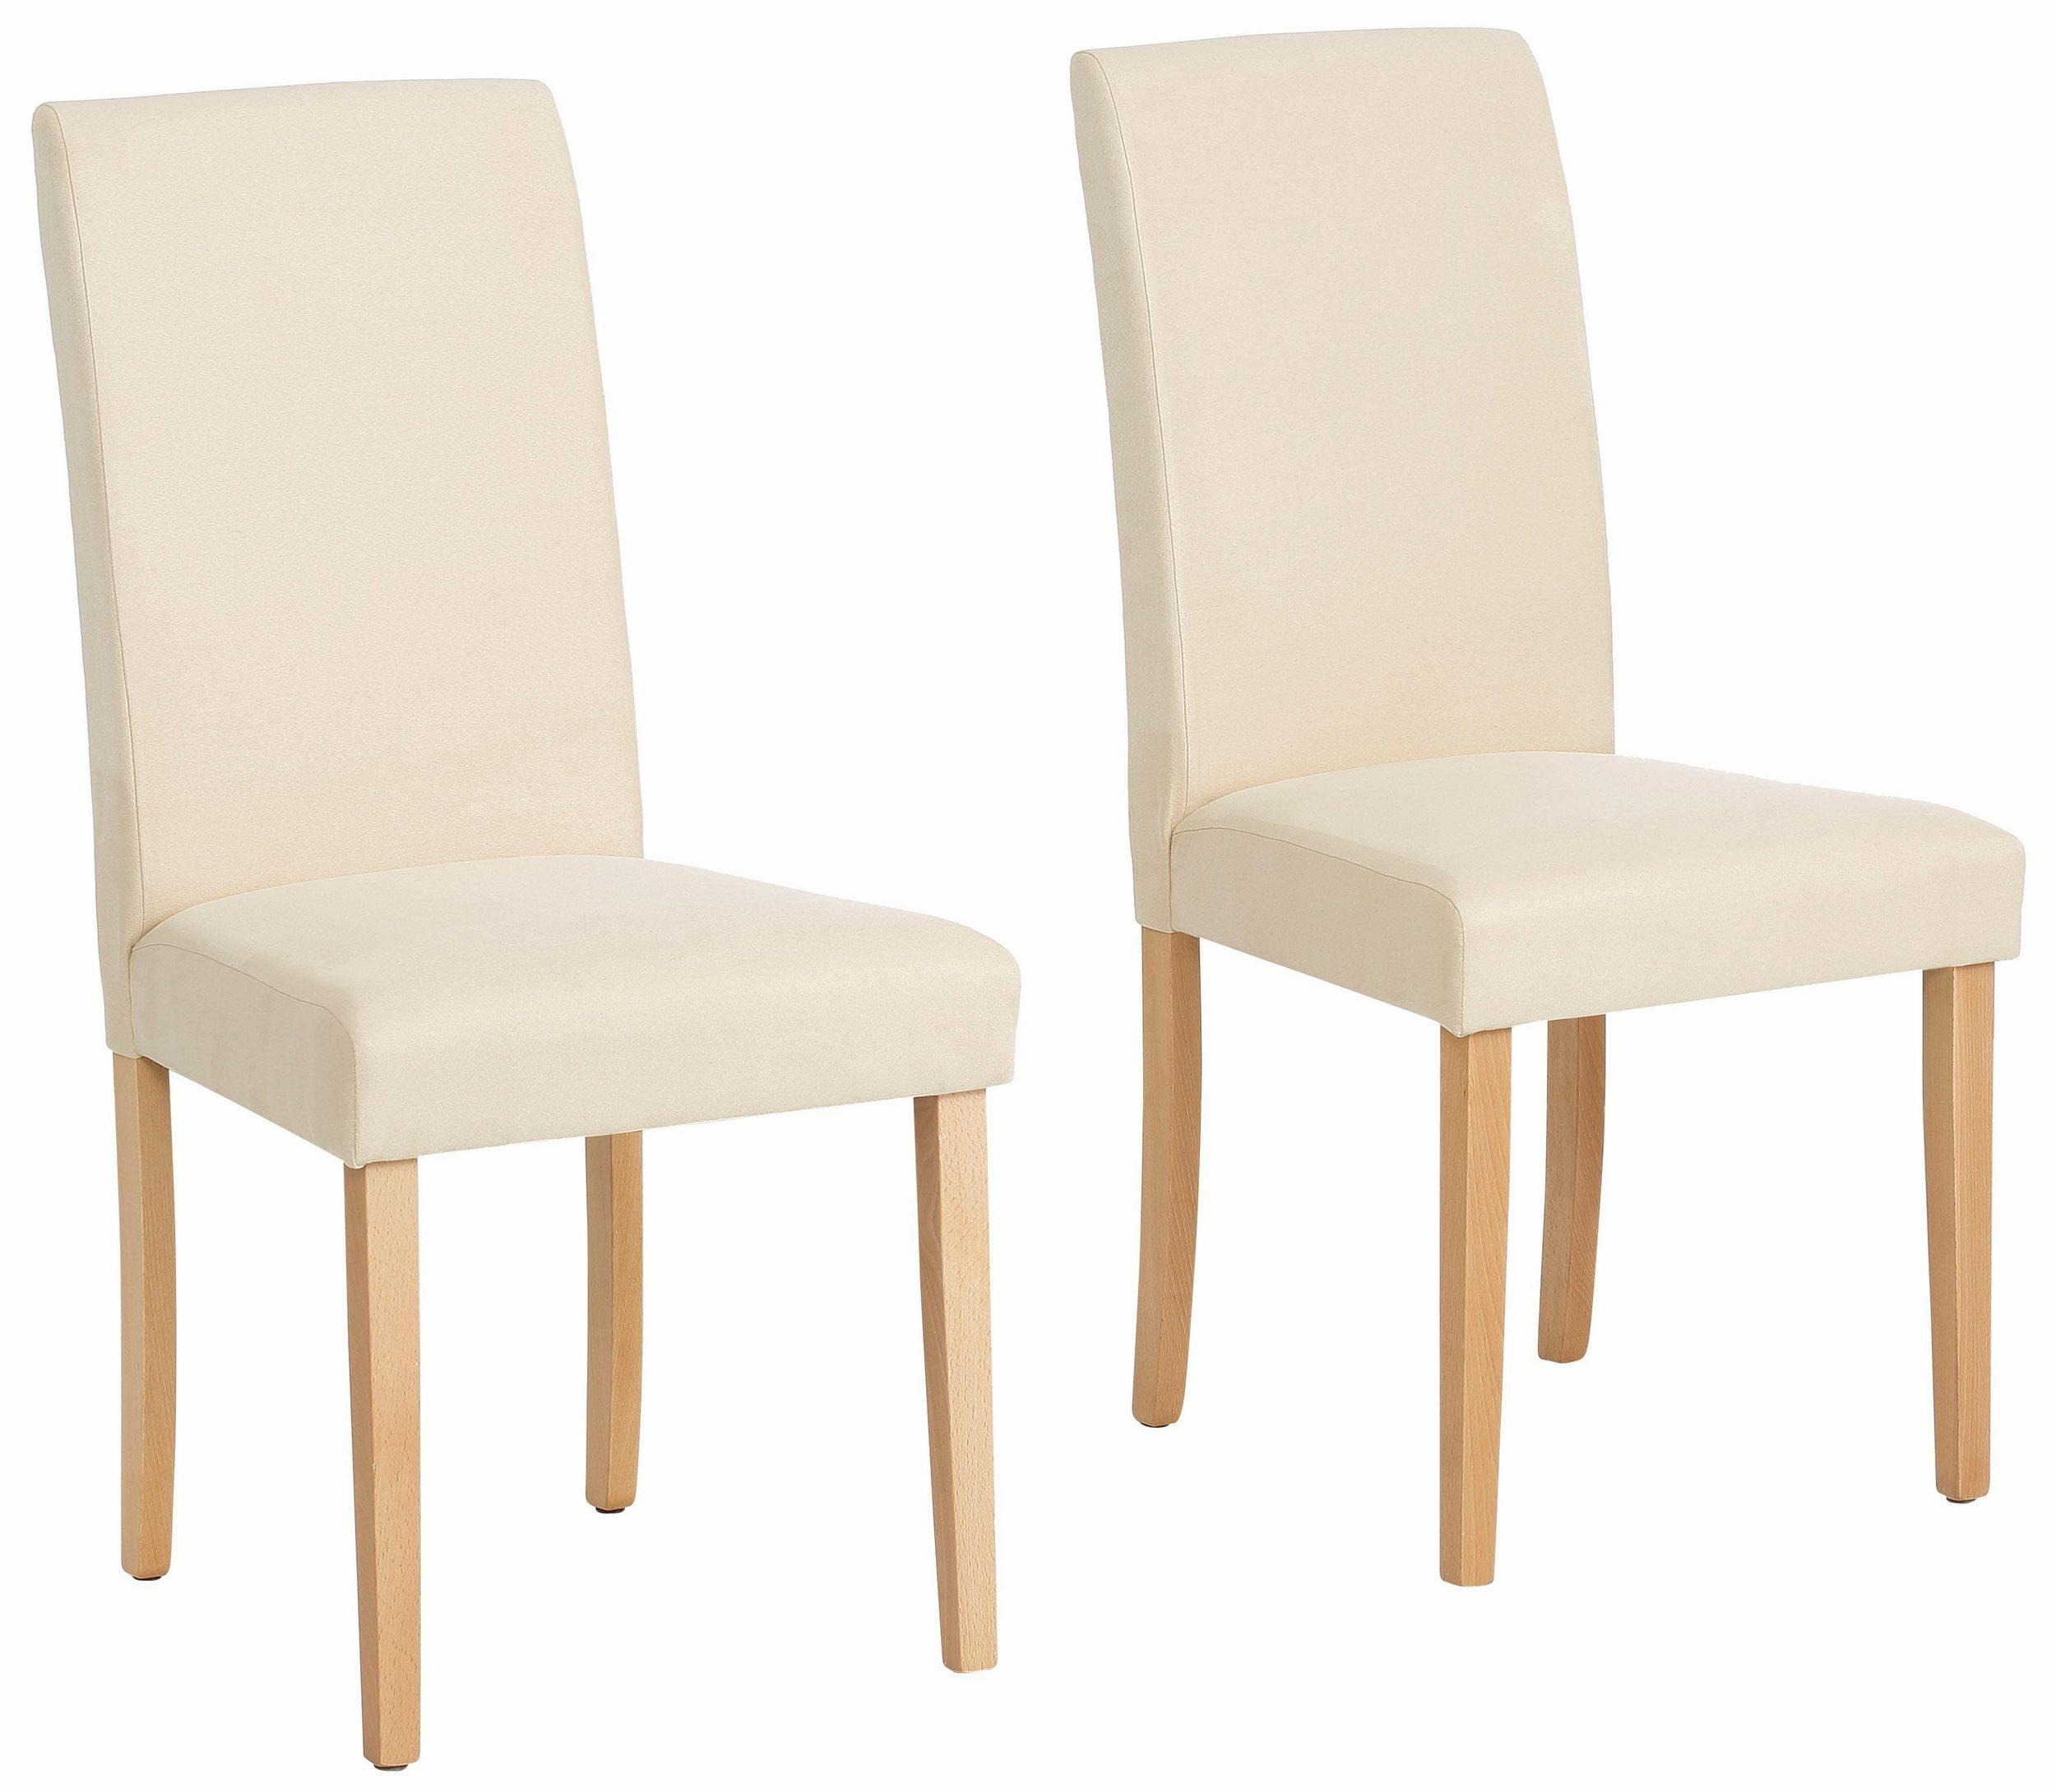 25 sparen home affaire st hle roko ab 119 99 cherry m bel otto. Black Bedroom Furniture Sets. Home Design Ideas